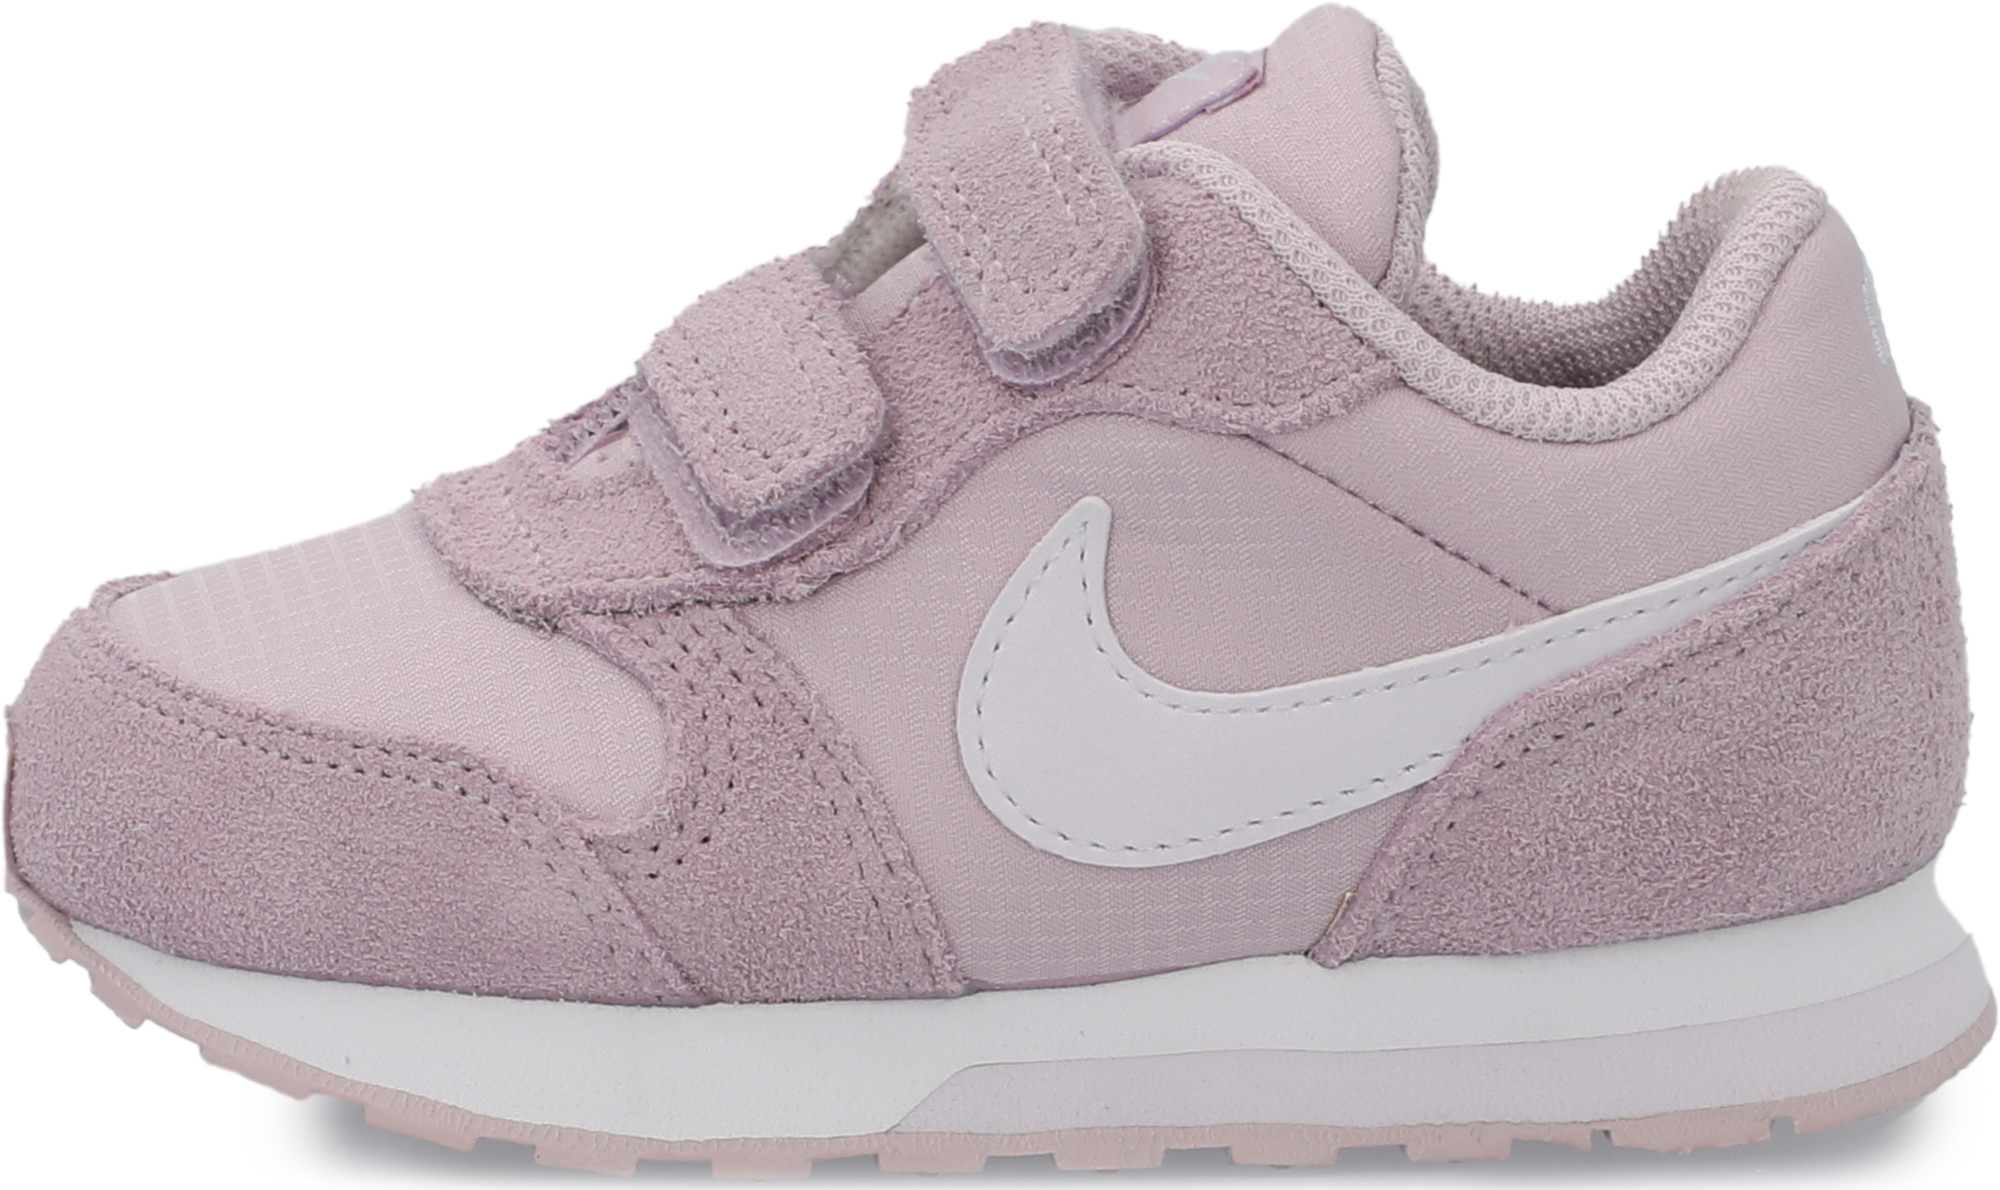 Nike Кроссовки для девочек Nike Md Runner 2 Pe, размер 24